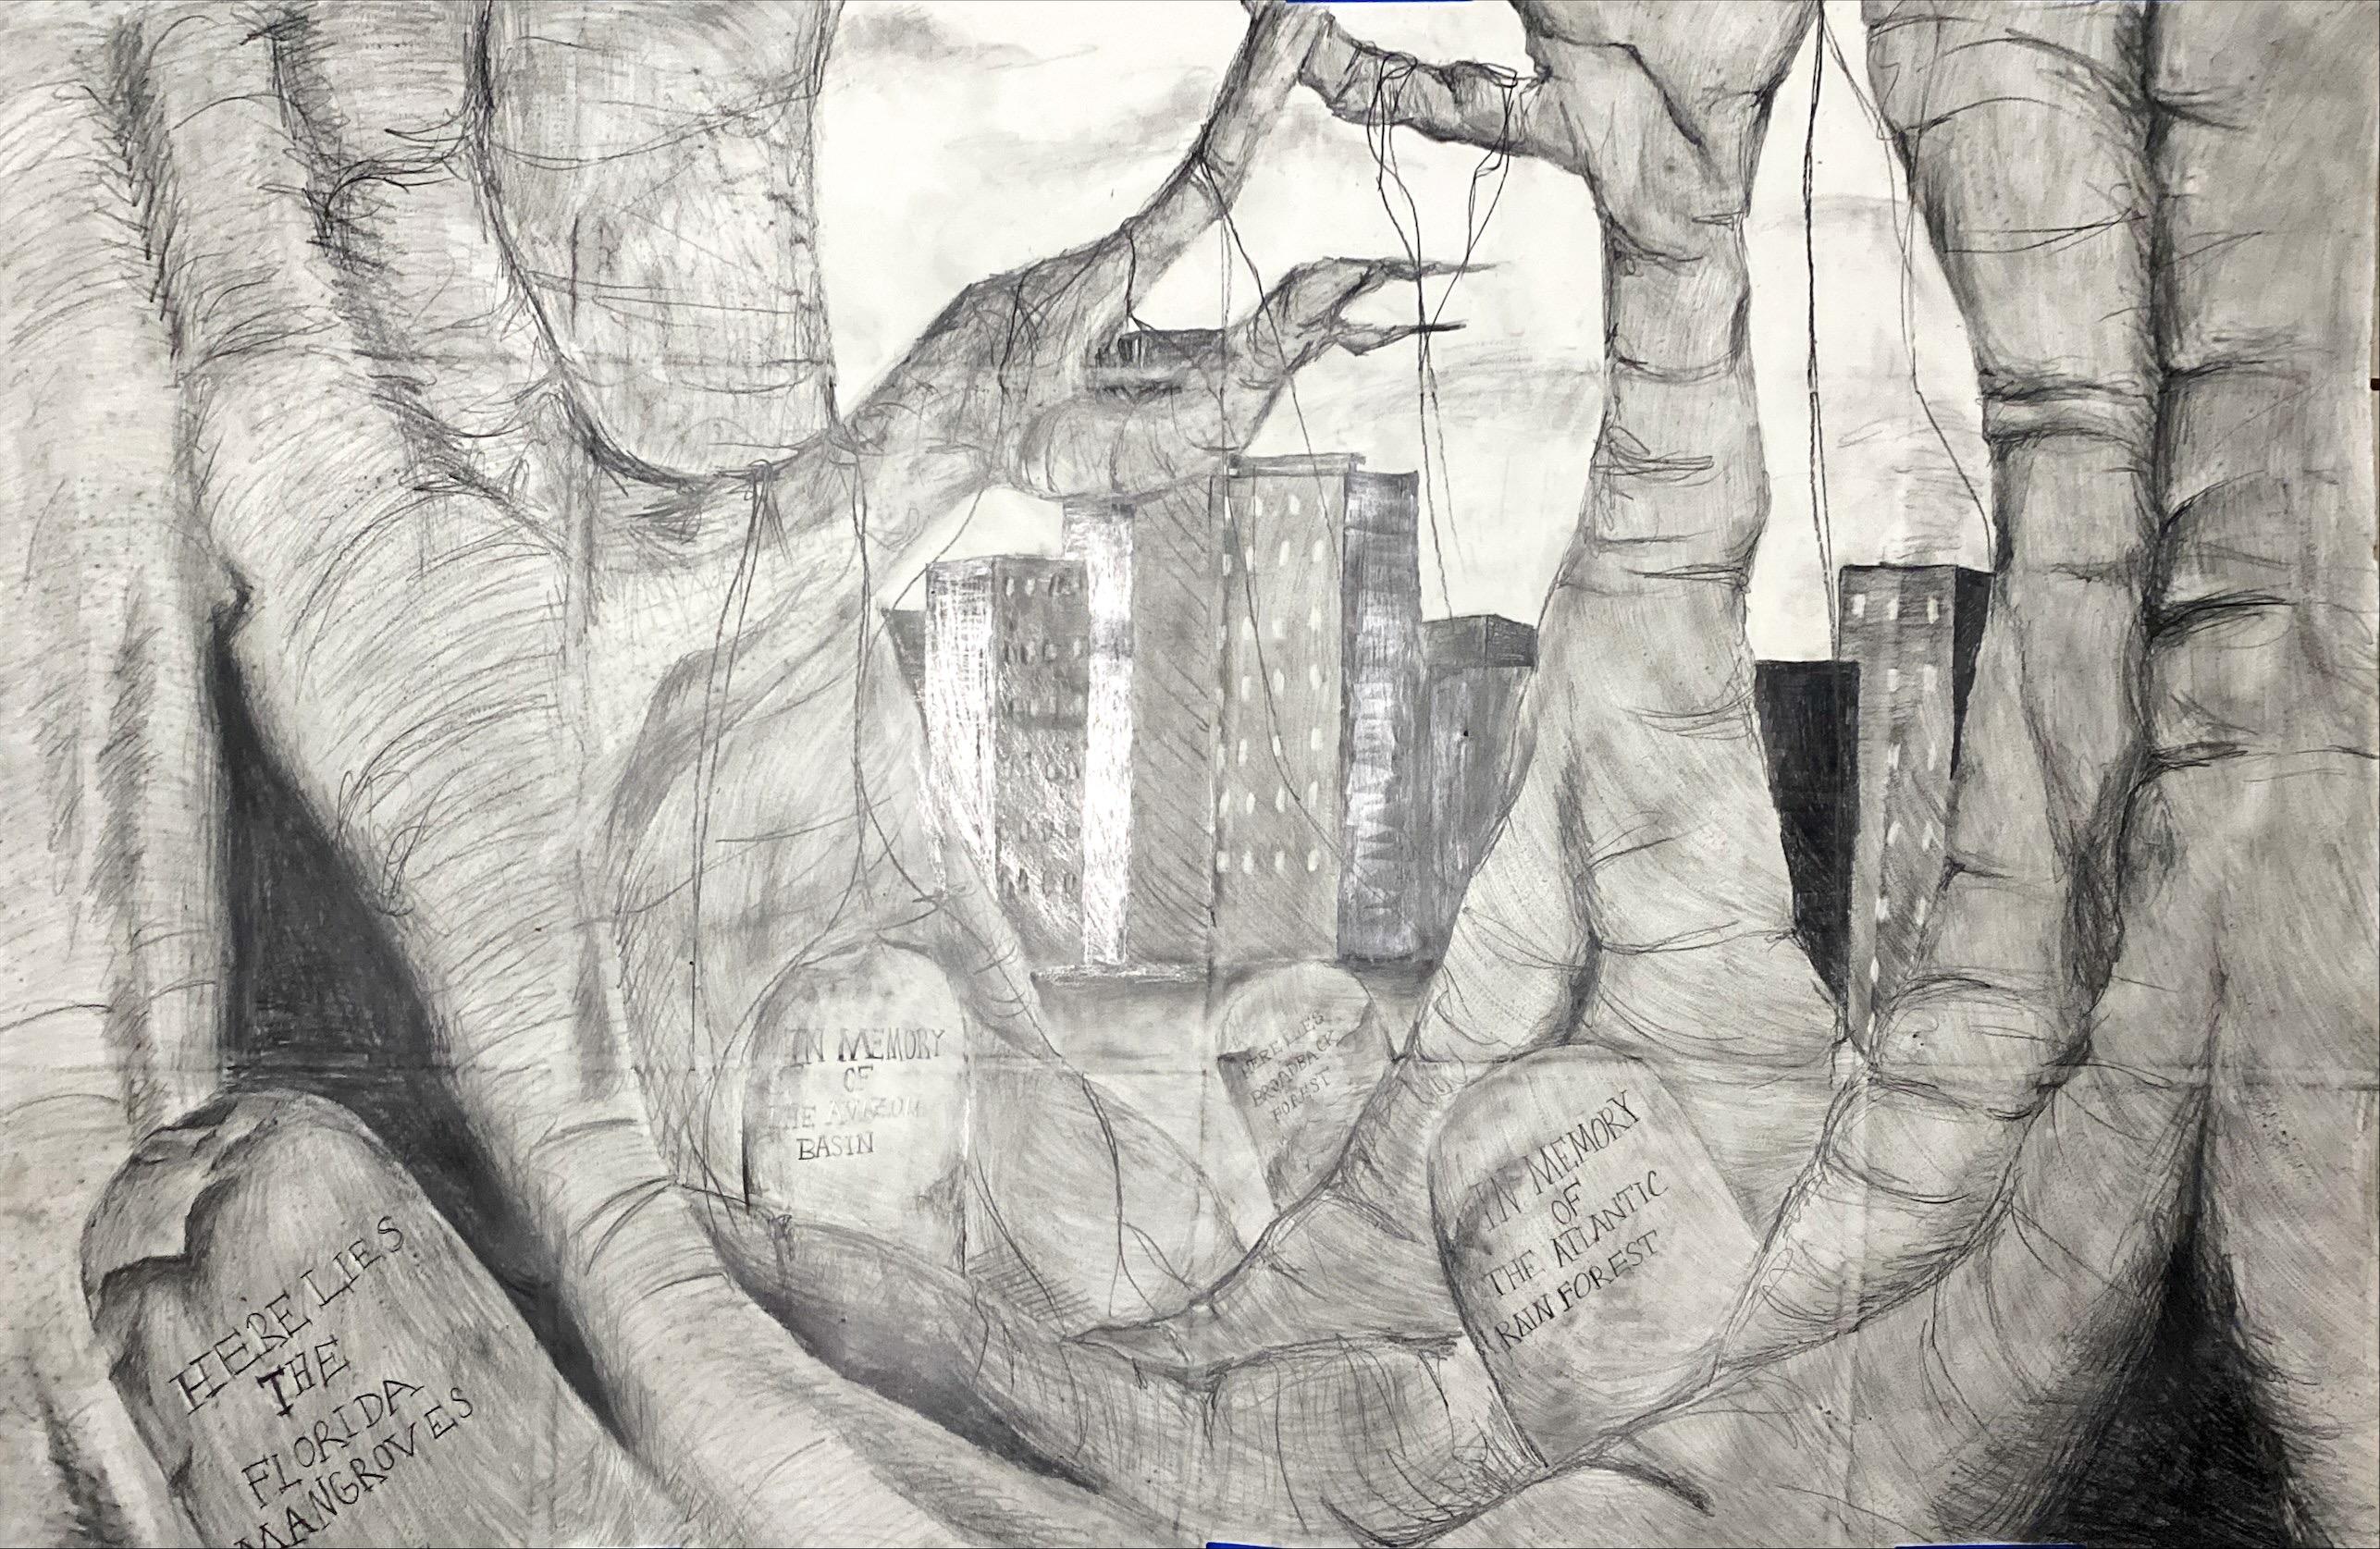 Jessica Harding Project, Image 1